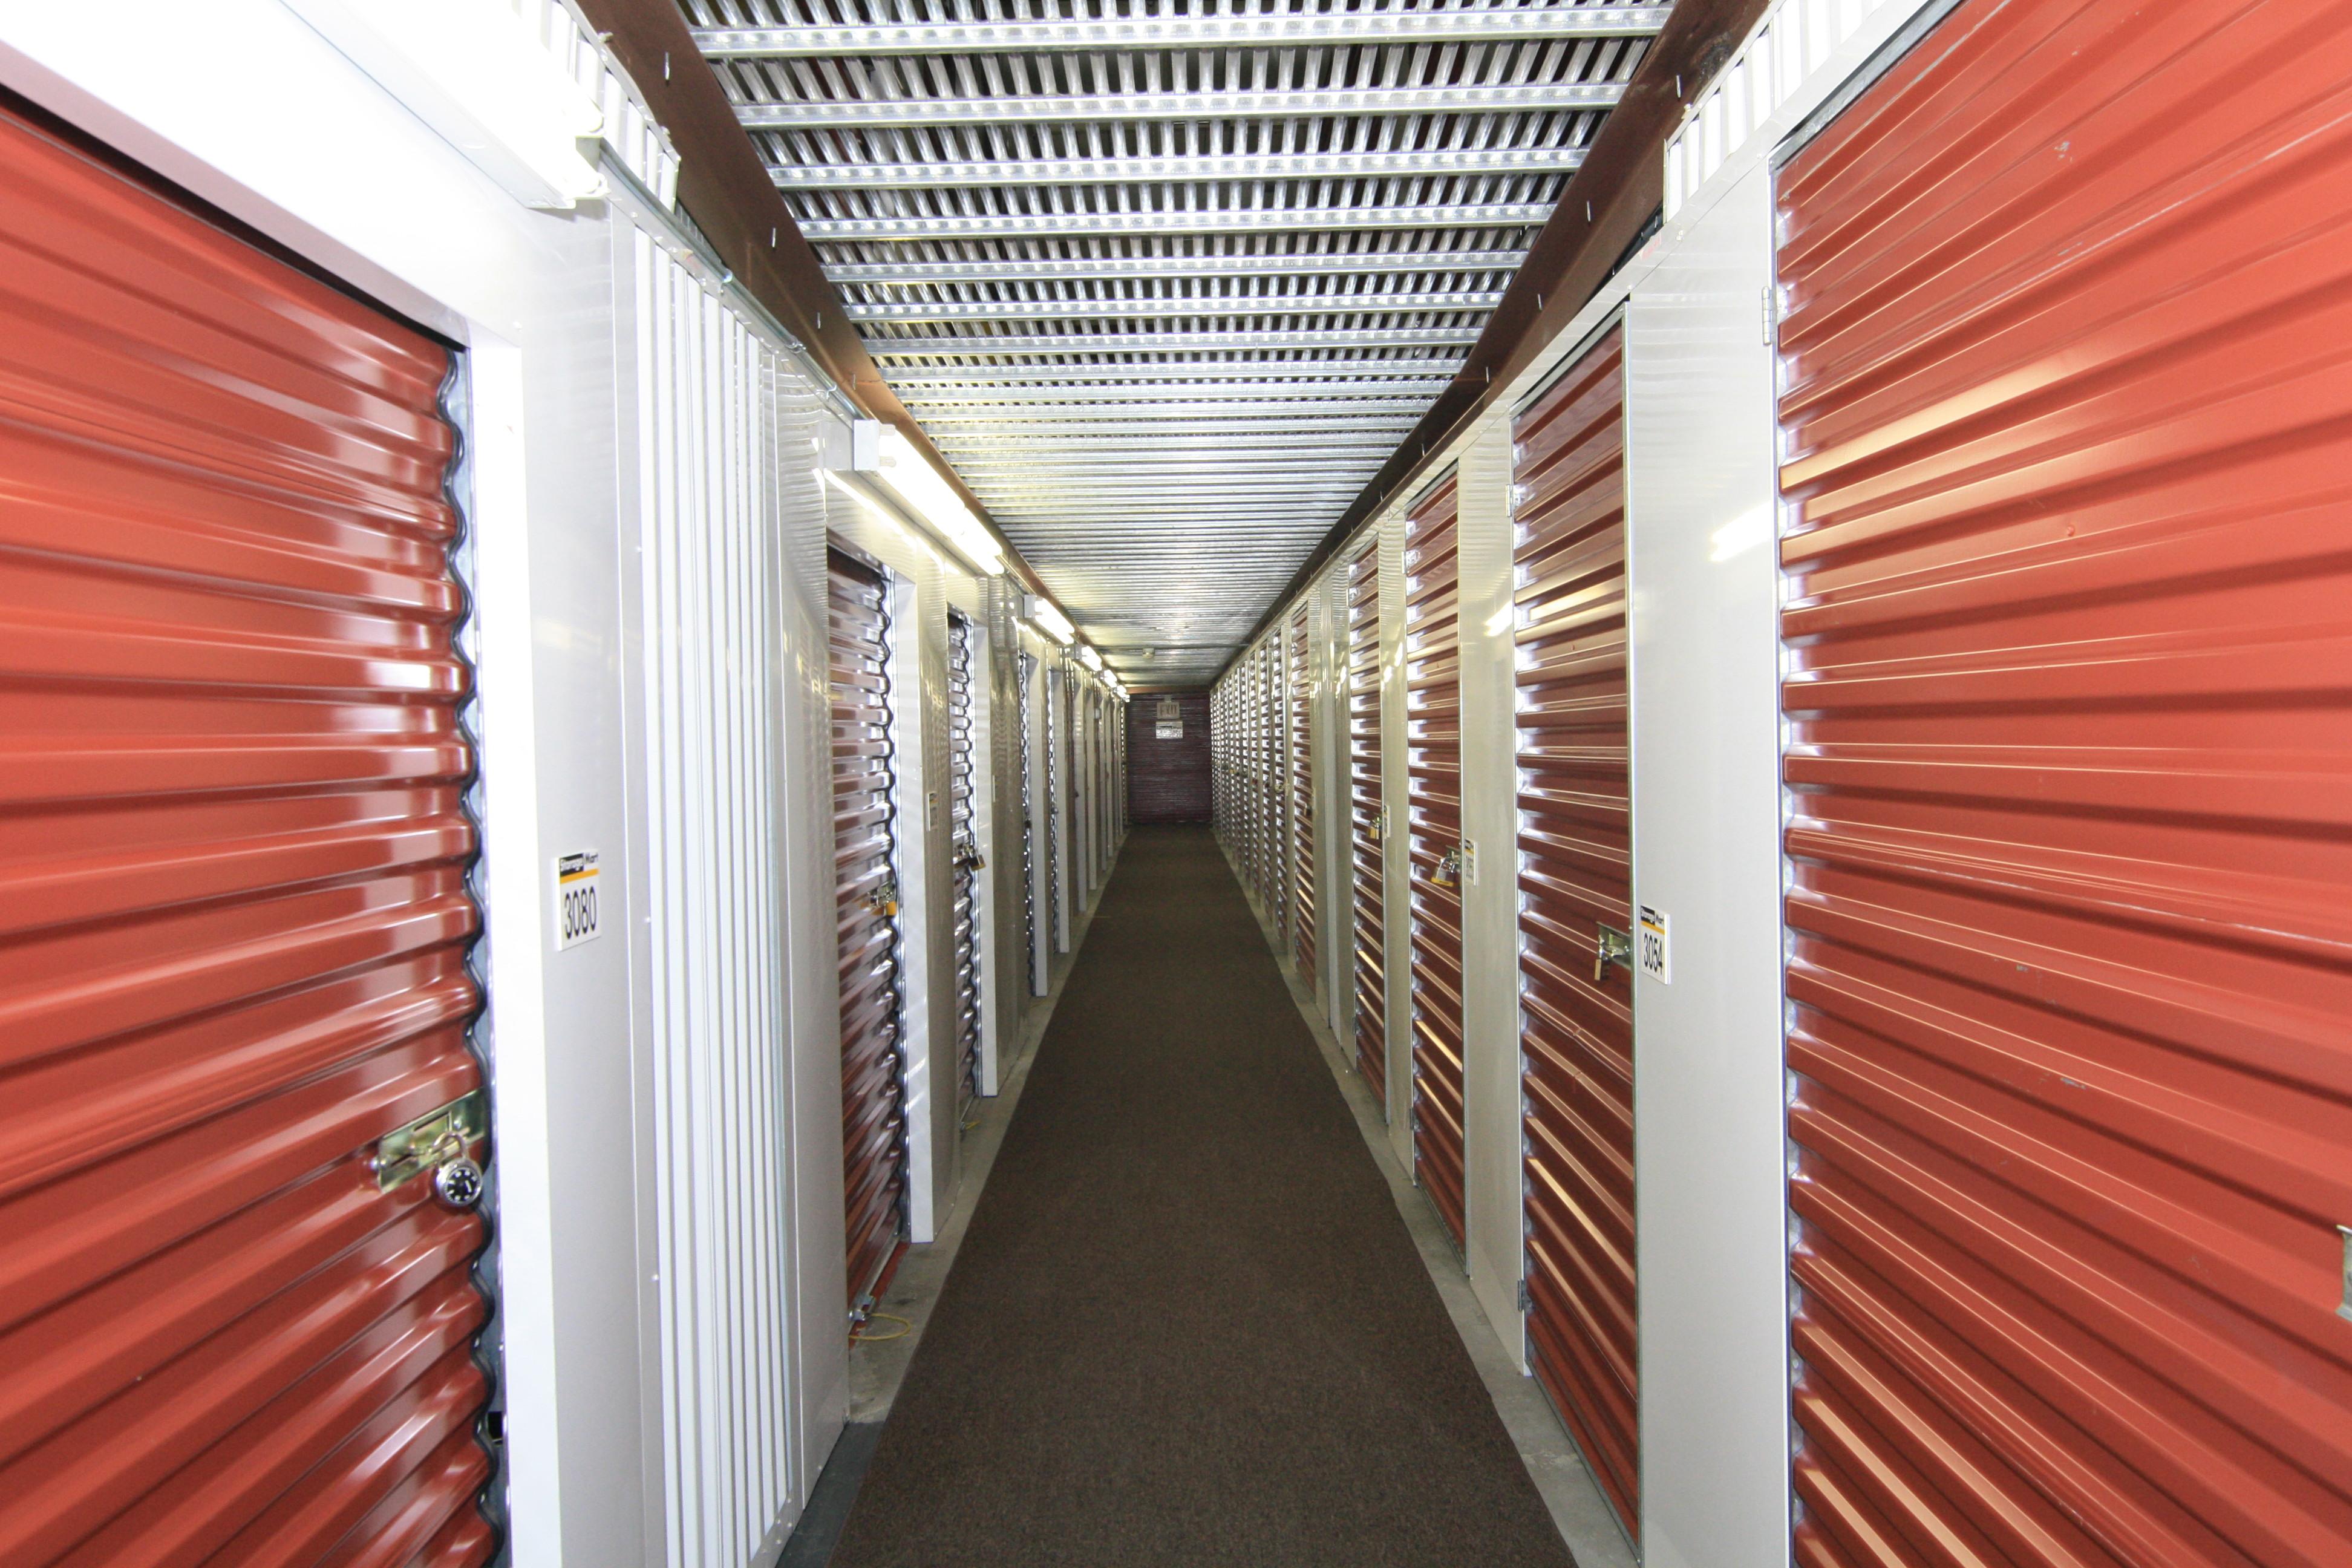 StorageMart in Brooklyn, NY 11232 - ChamberofCommerce.com